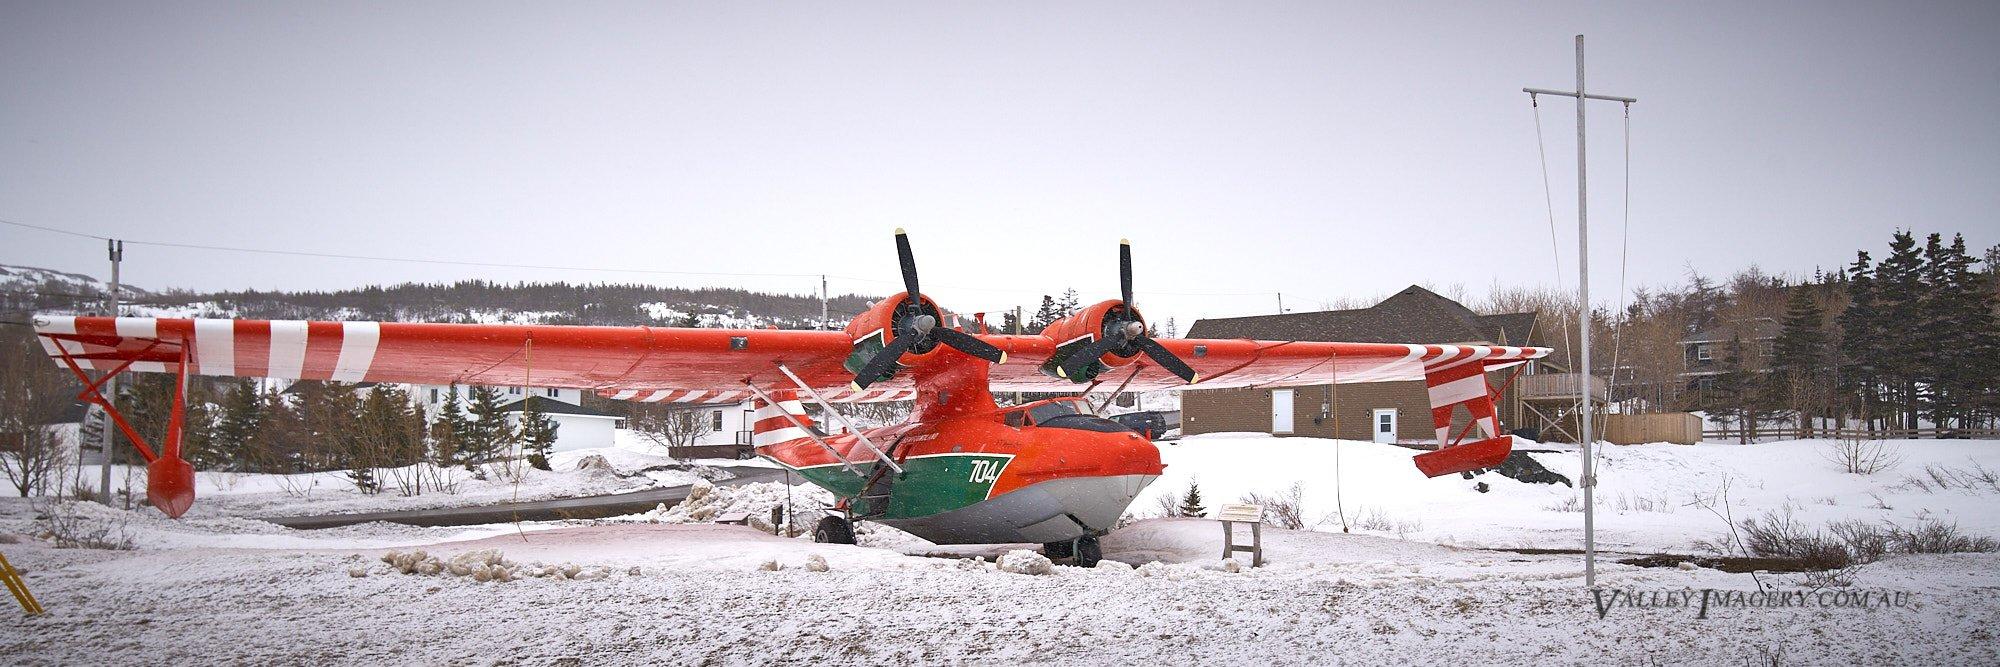 Catalina aircraft snow newfoundland